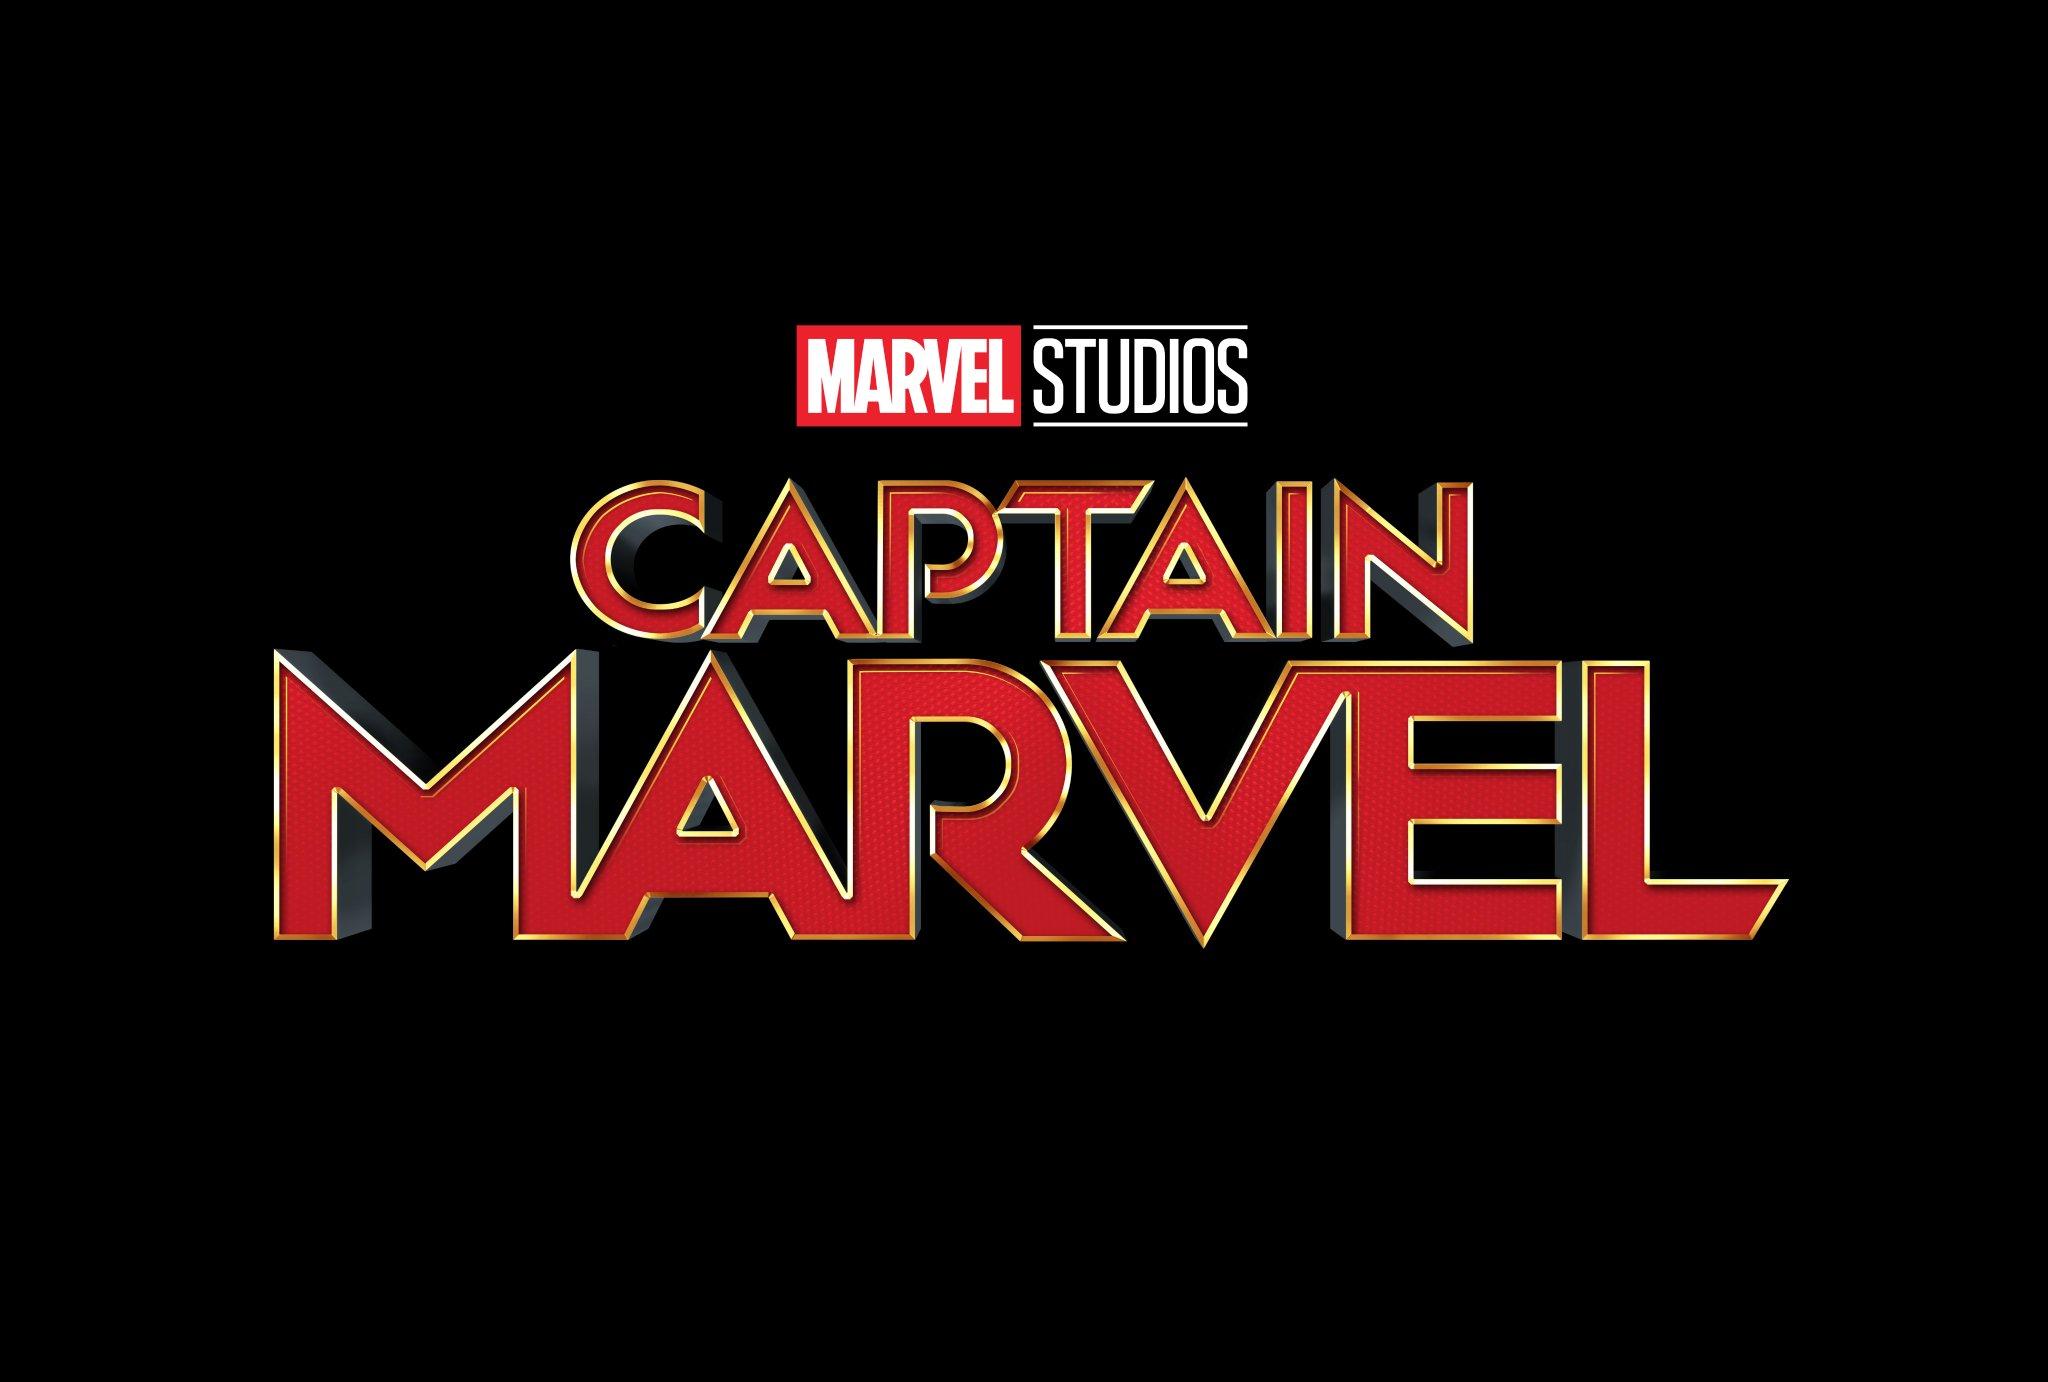 capitan marvel logo